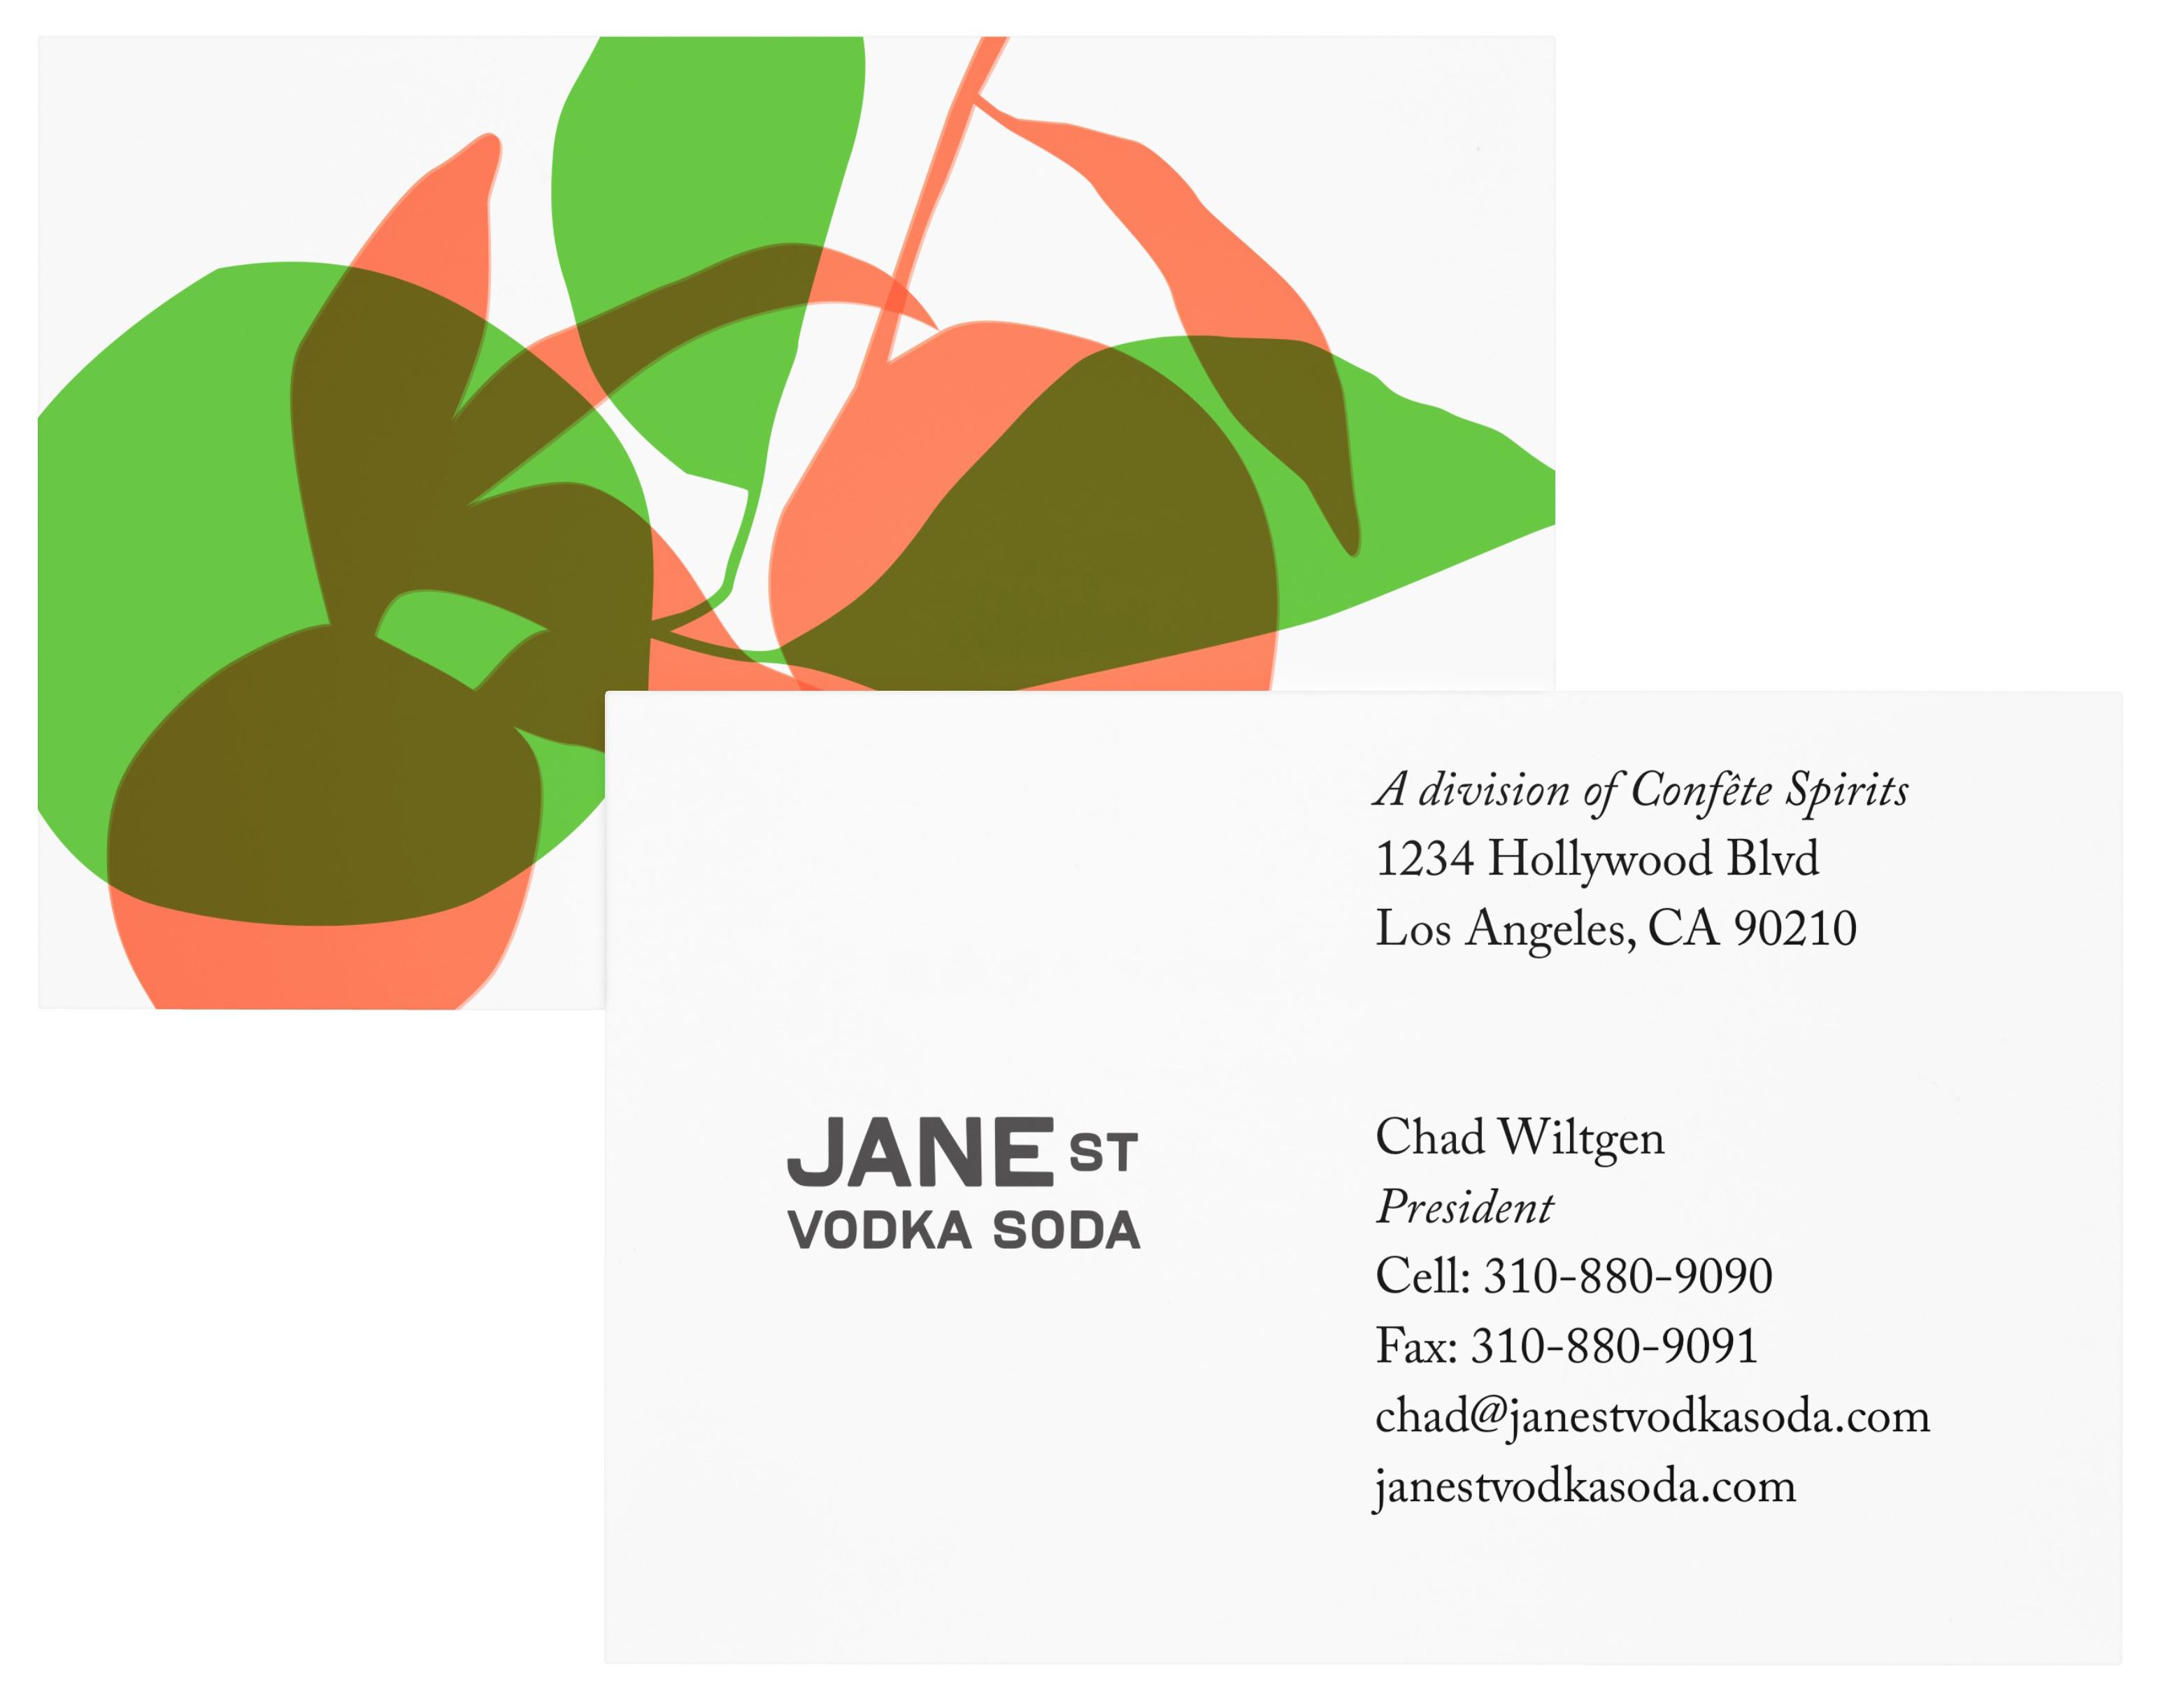 Jane St Vodka Soda - Elise Mattingly